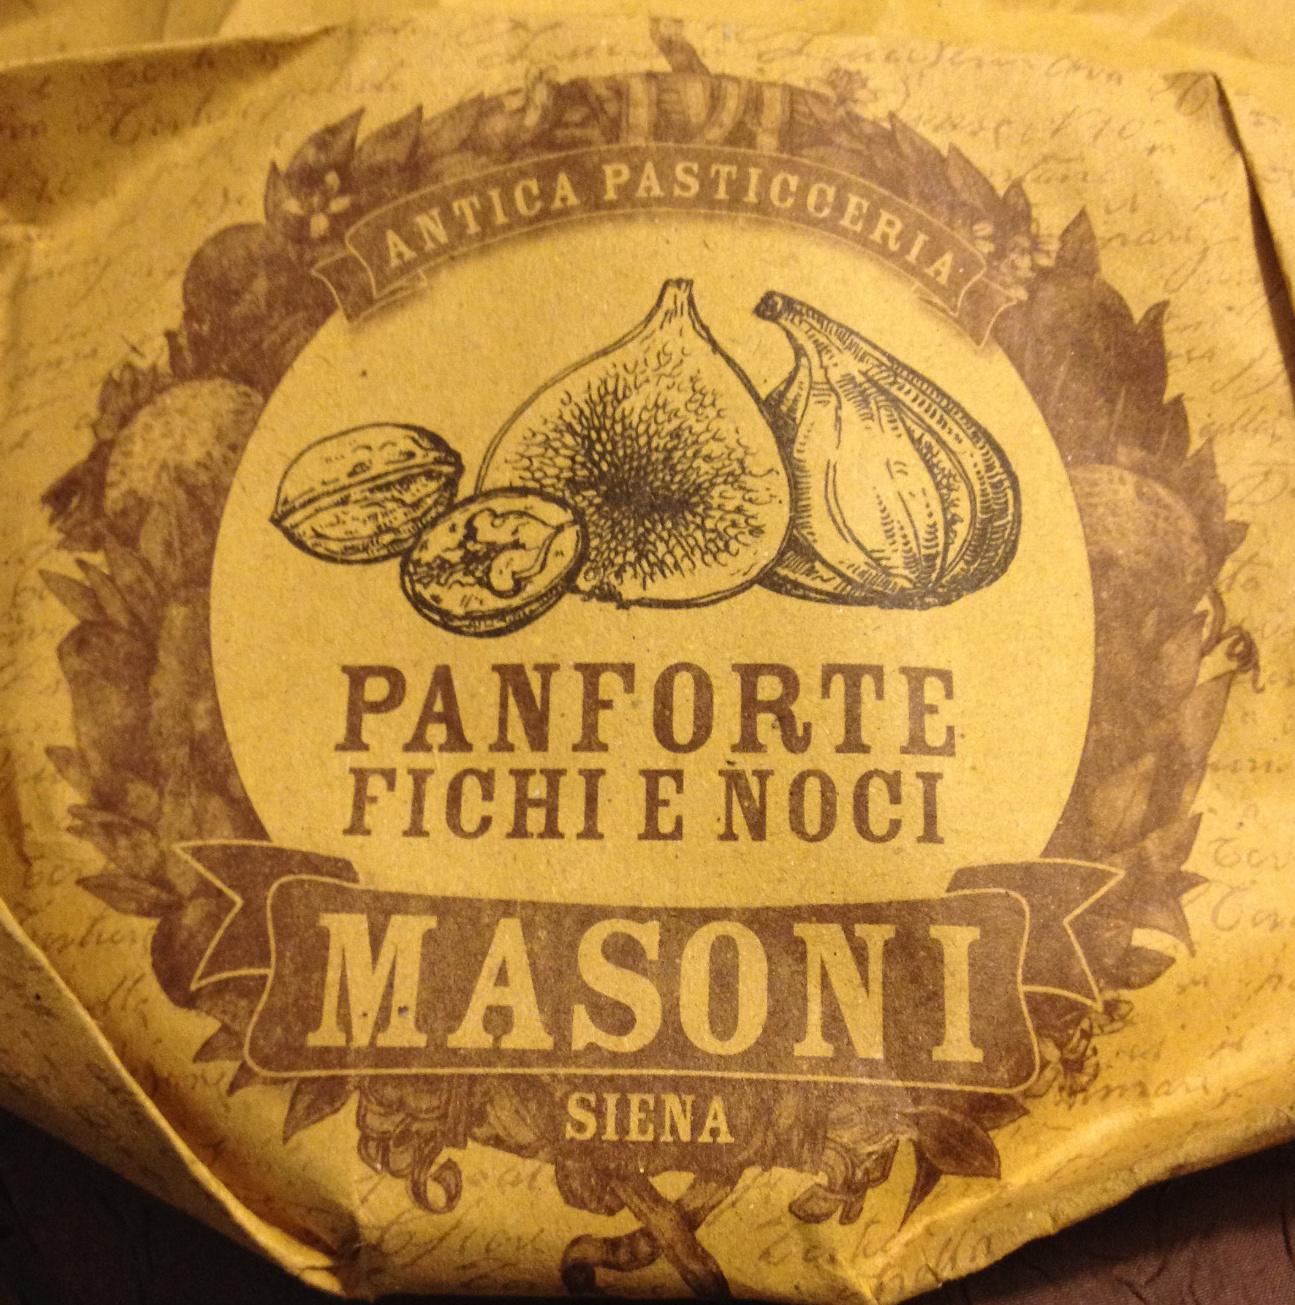 Panforte Fichi e Noci - Product